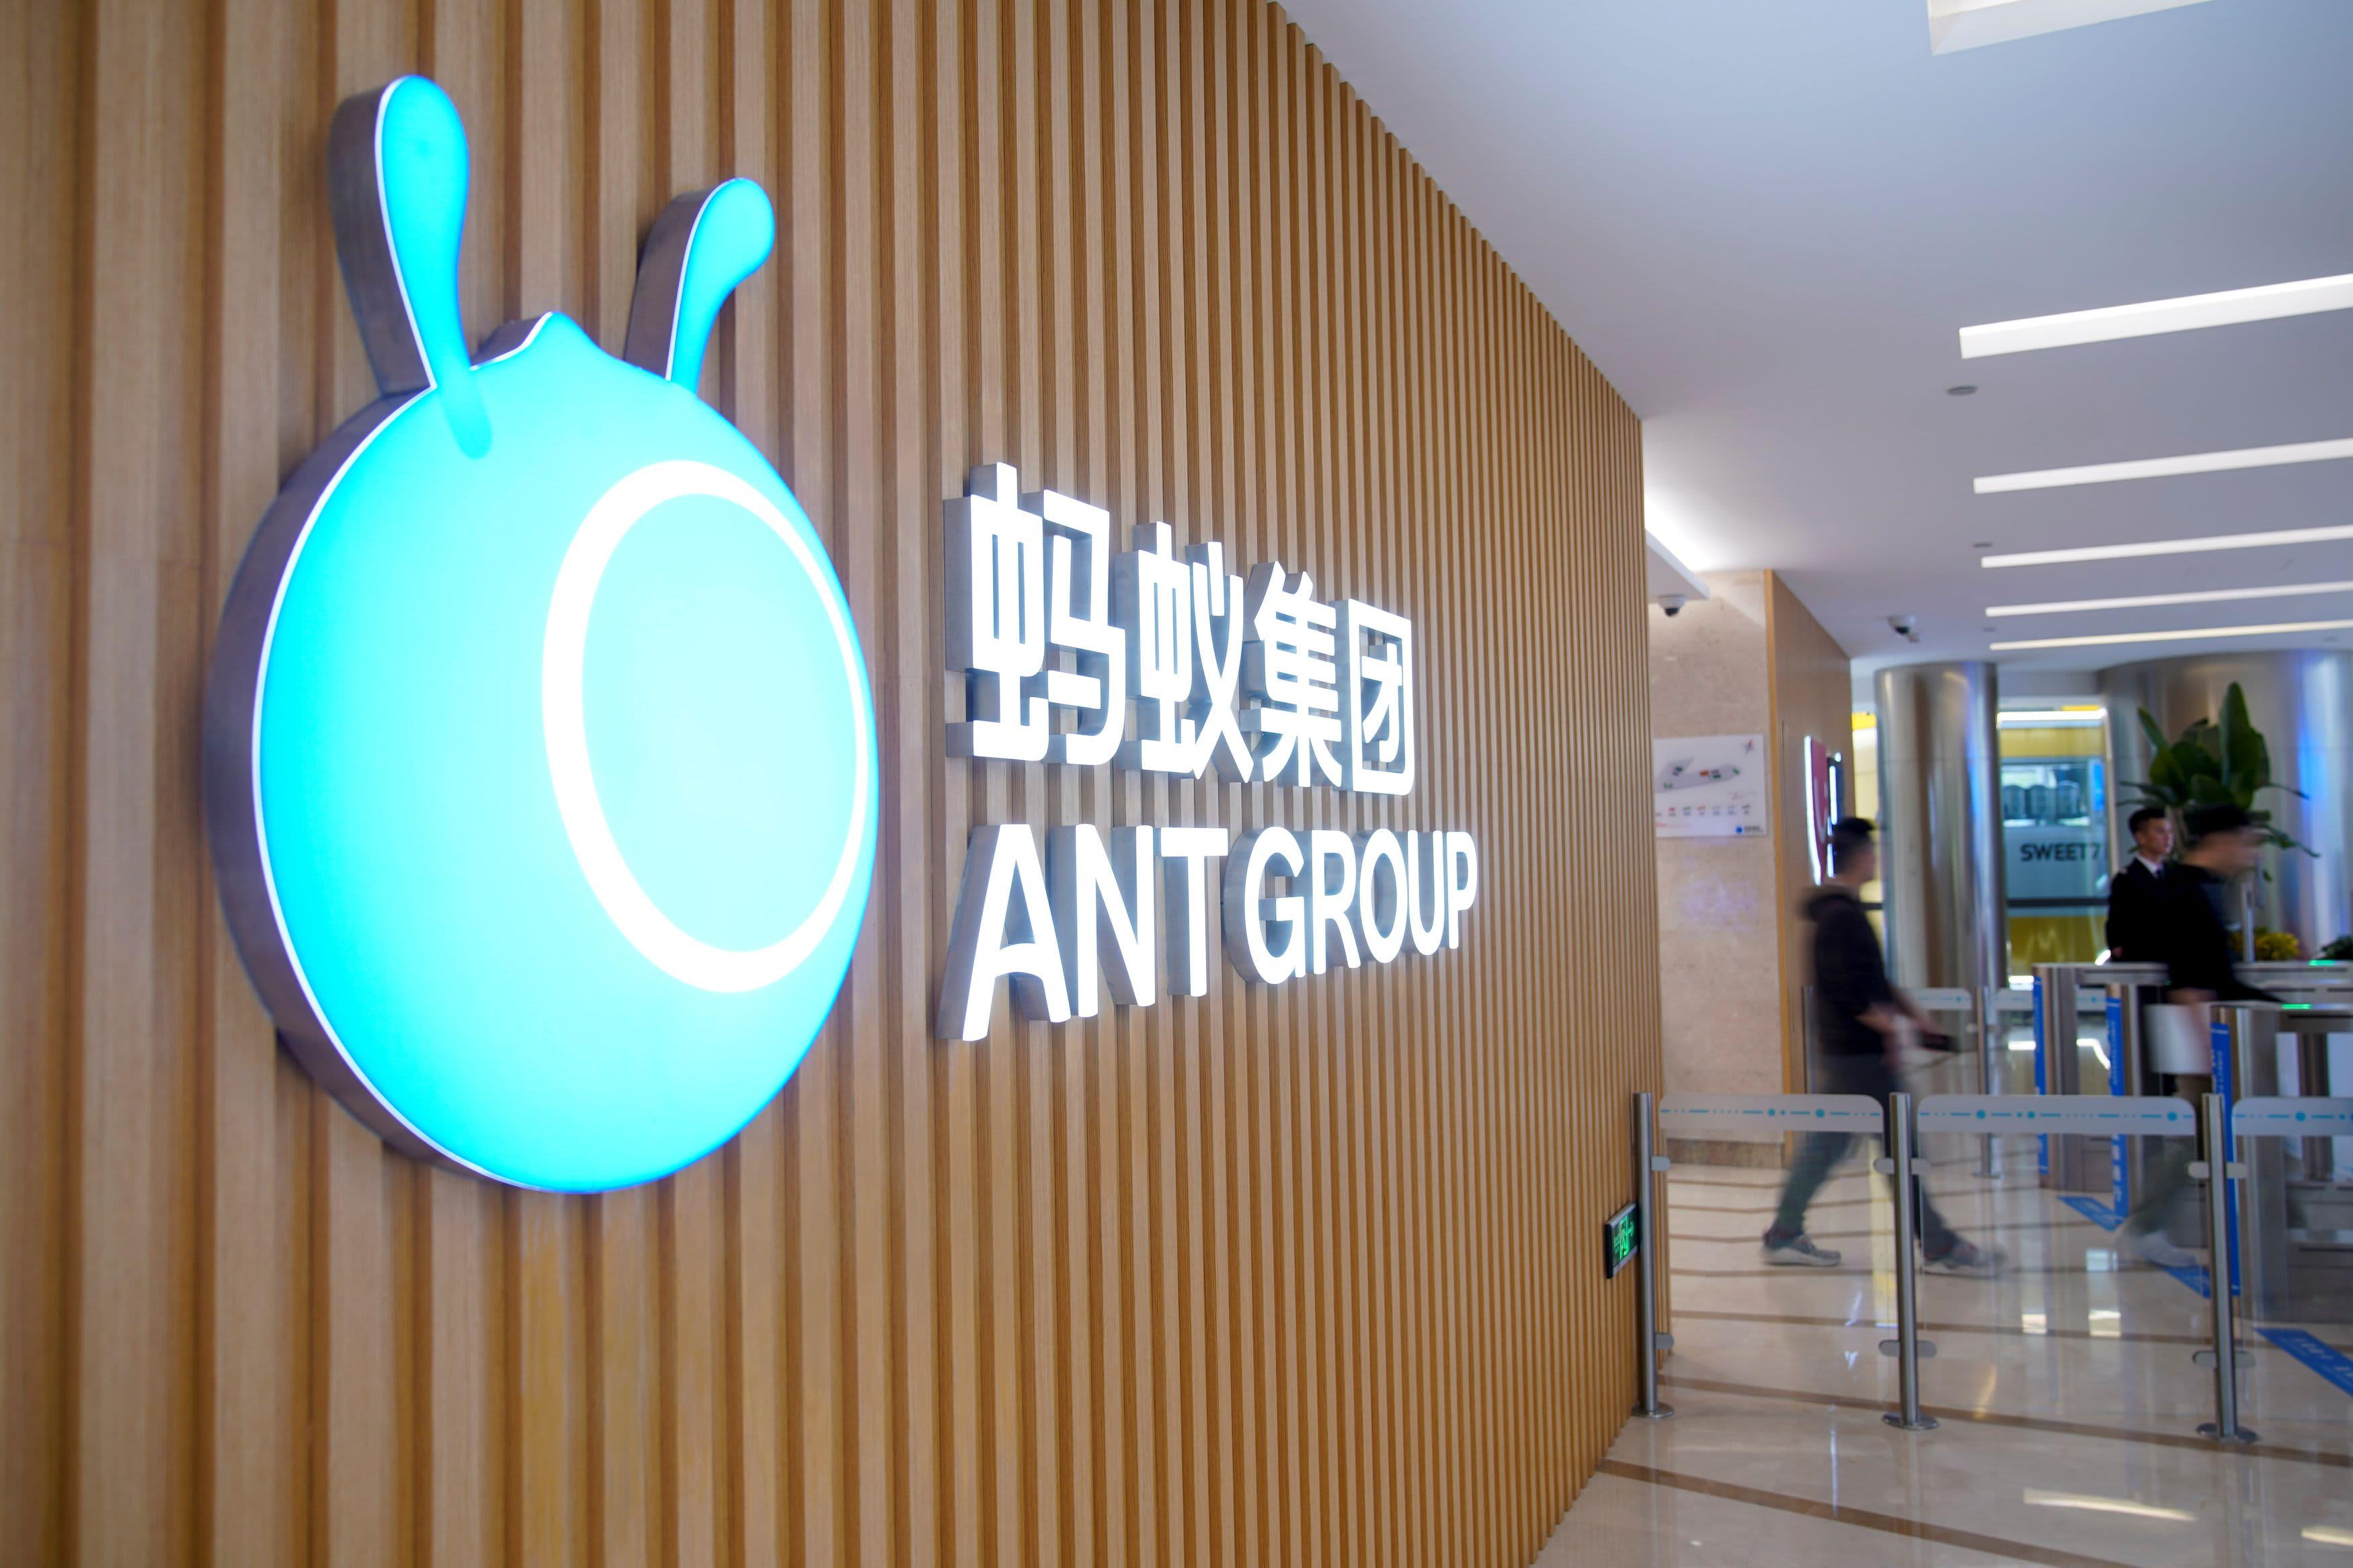 Ant Personnel untuk memecah catatan kredit pengguna dengan lembaga keuangan sentra China ketika perbaikan peraturan berlanjut thumbnail